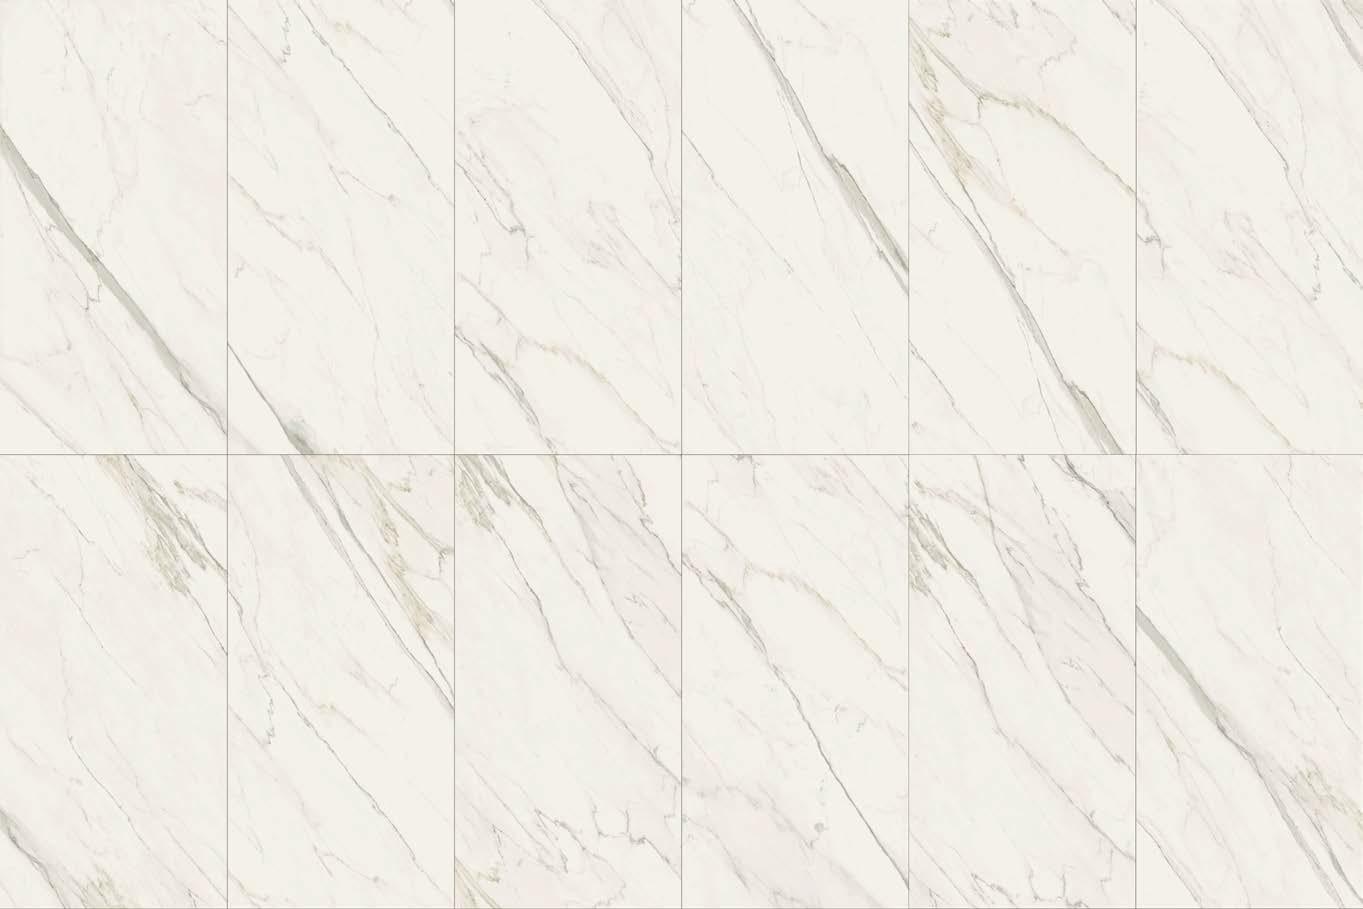 Gresie portelanata rectificata Iris Marmi 3.0 60x30cm 9mm Venato White